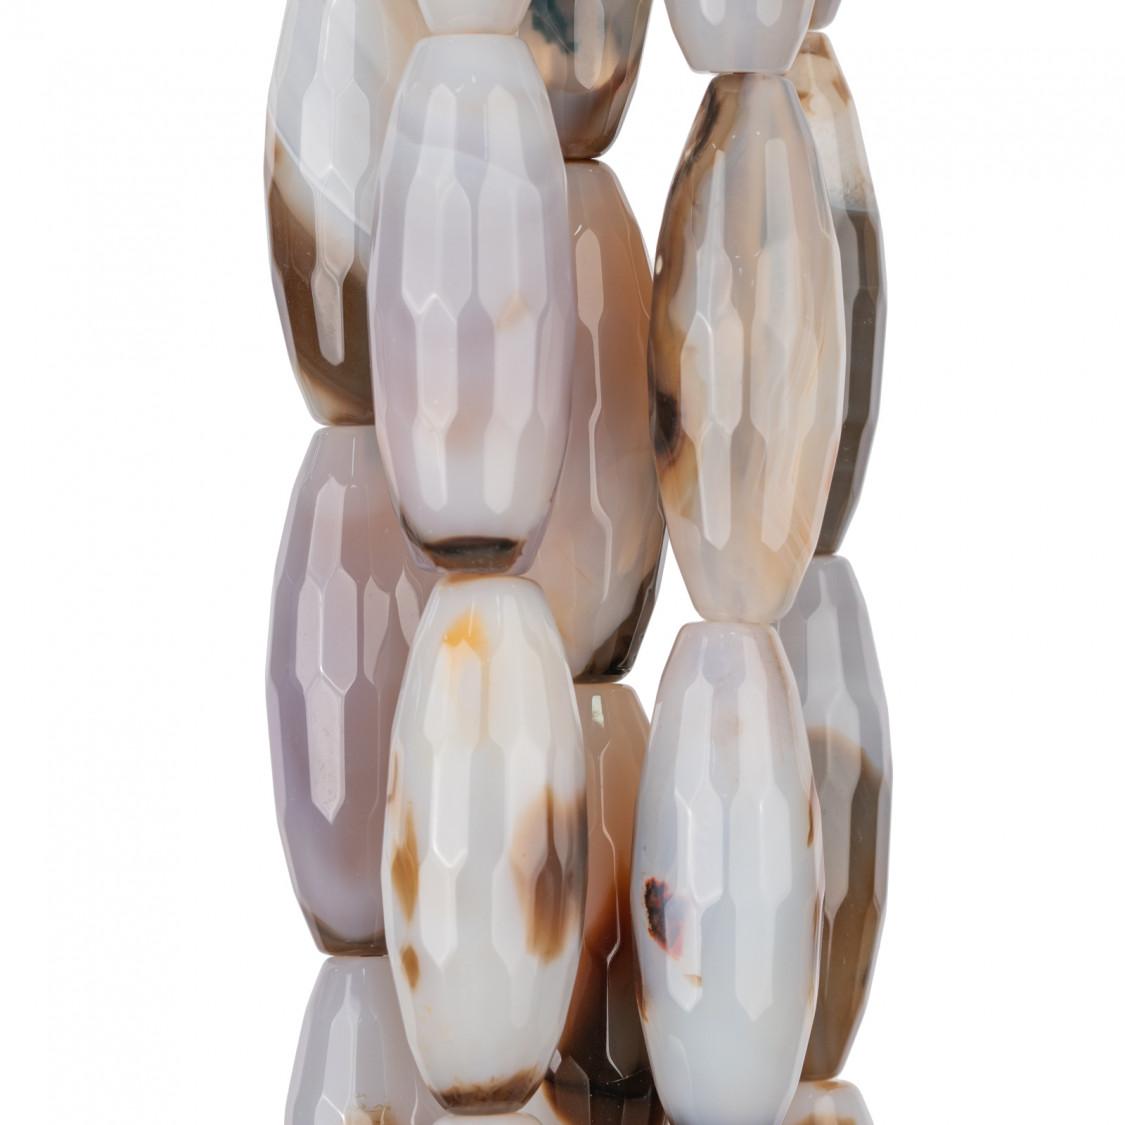 Perle Di Fiume Bottoni Cabochon 1 Foro (AA) 11.0-11.5mm 10 Paia Bianco